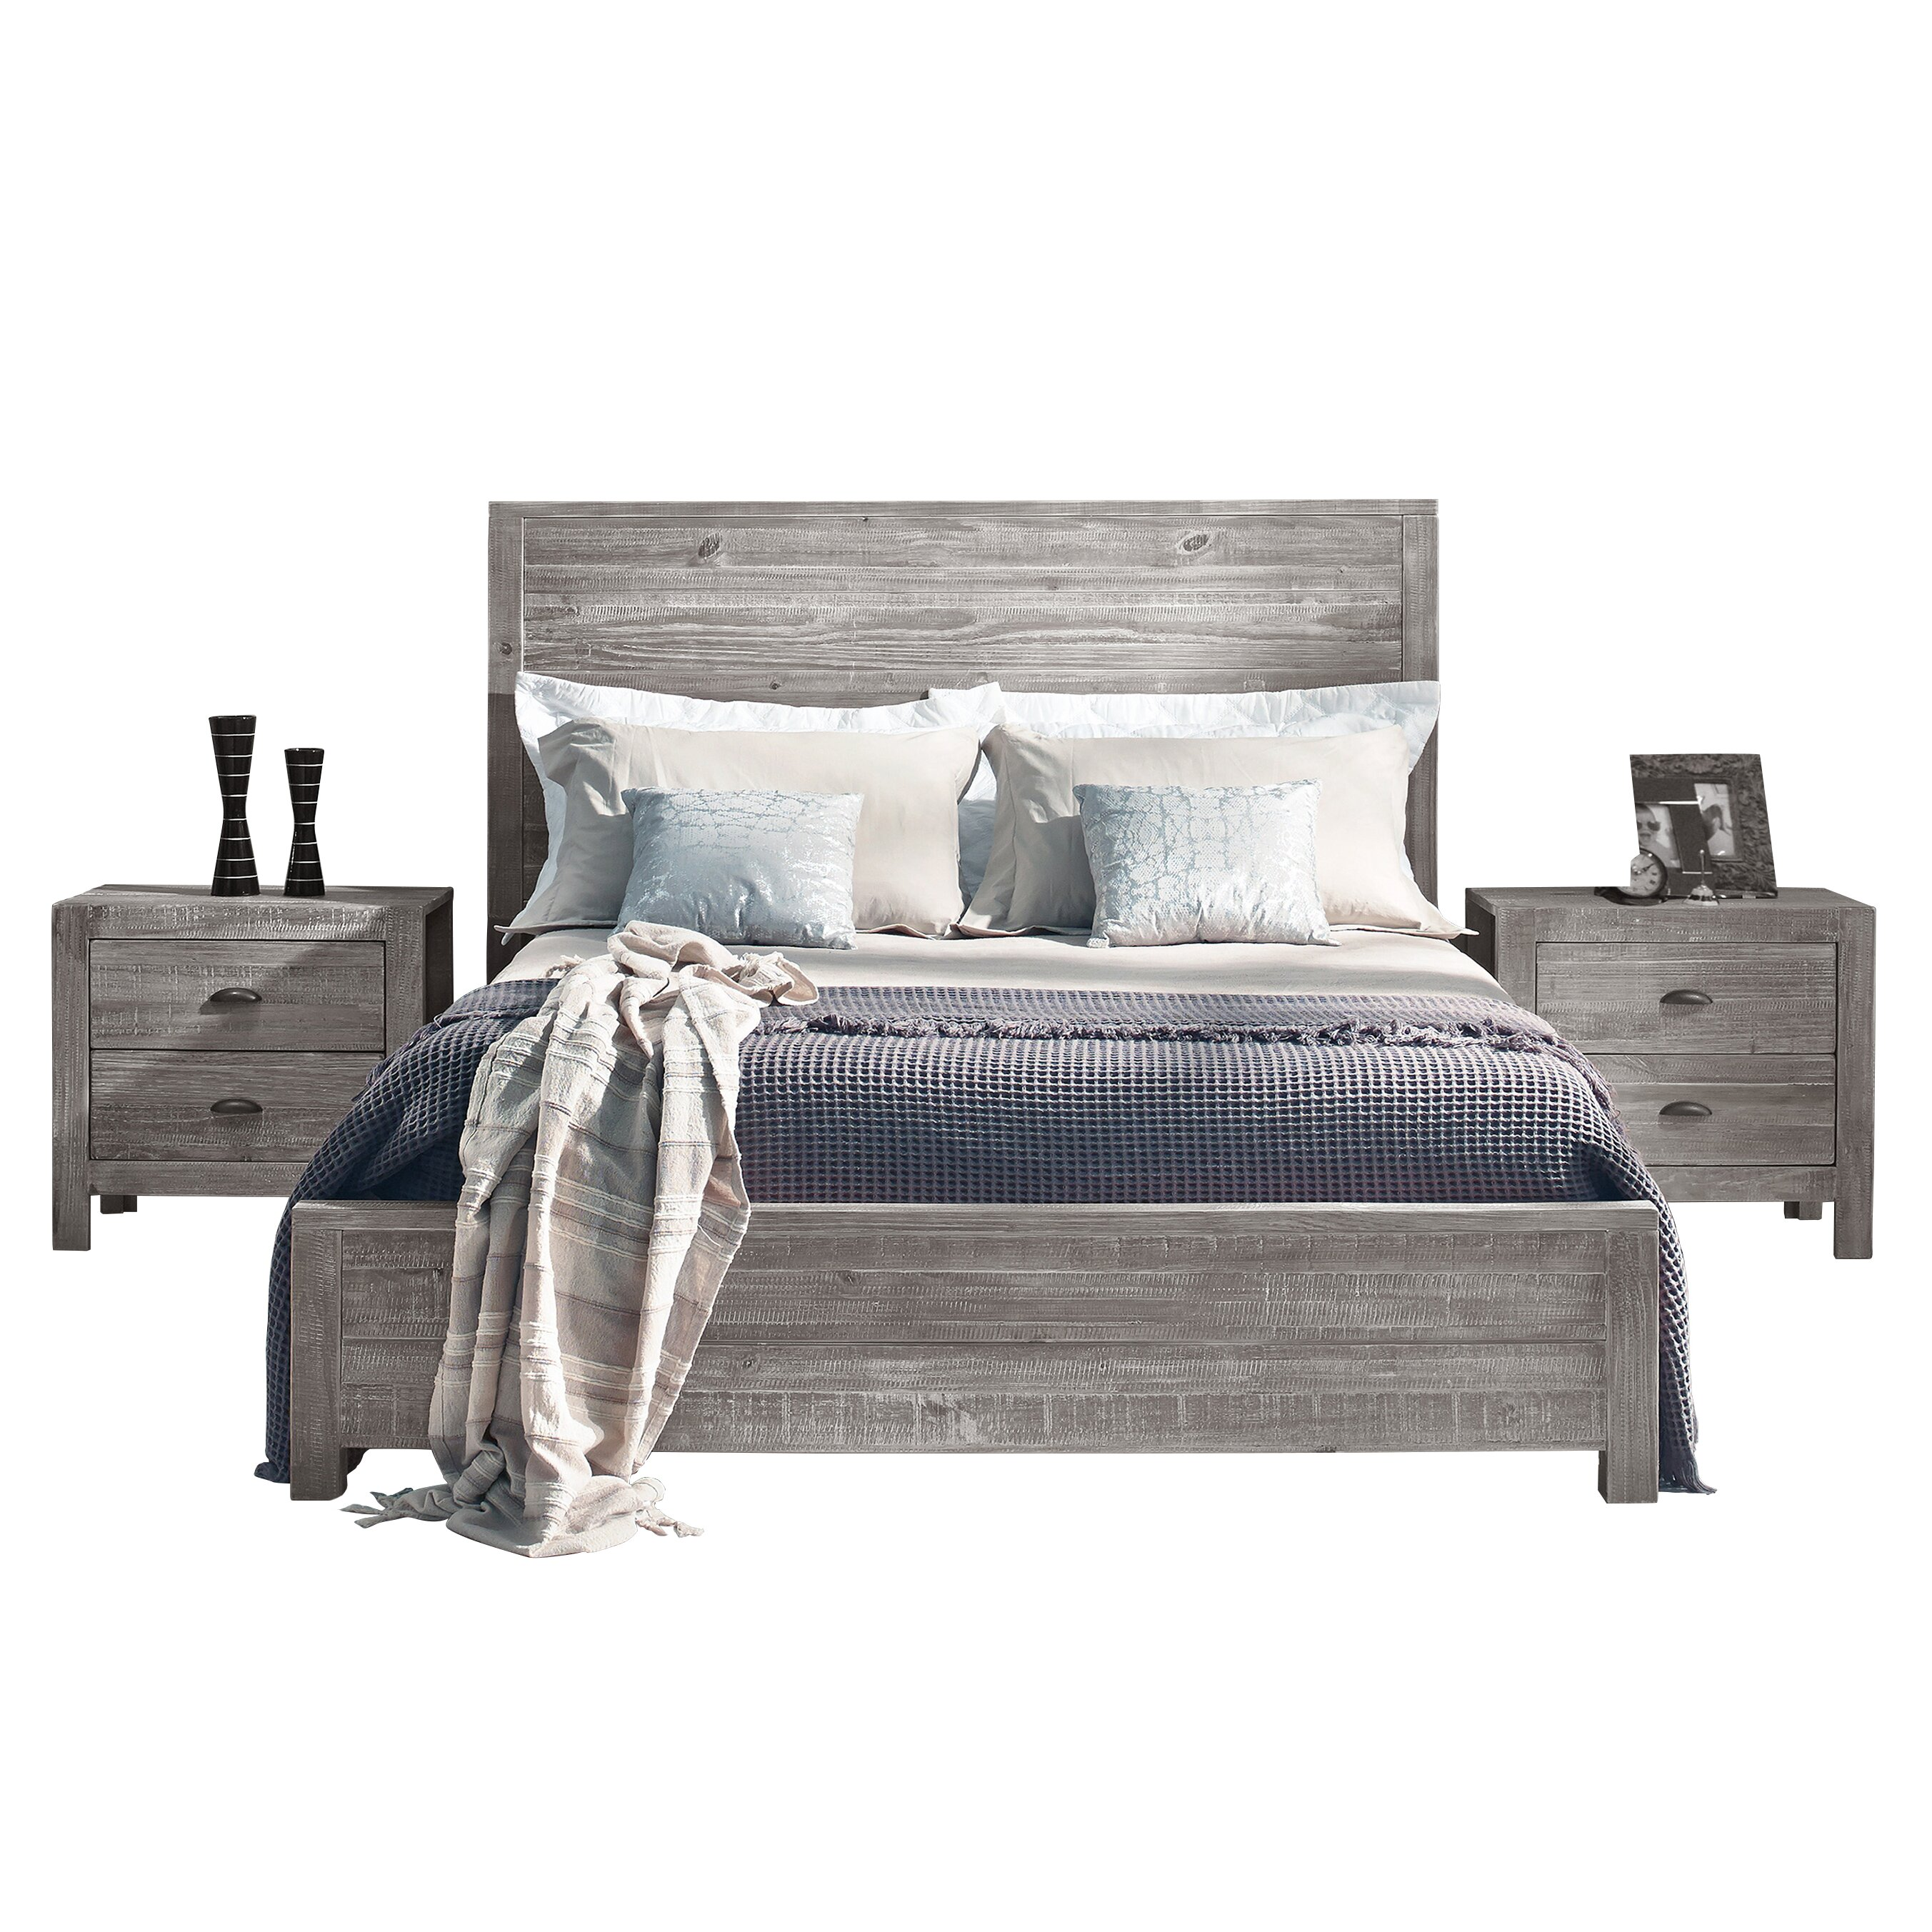 Montauk Panel Bed By Grain Wood Furniture King